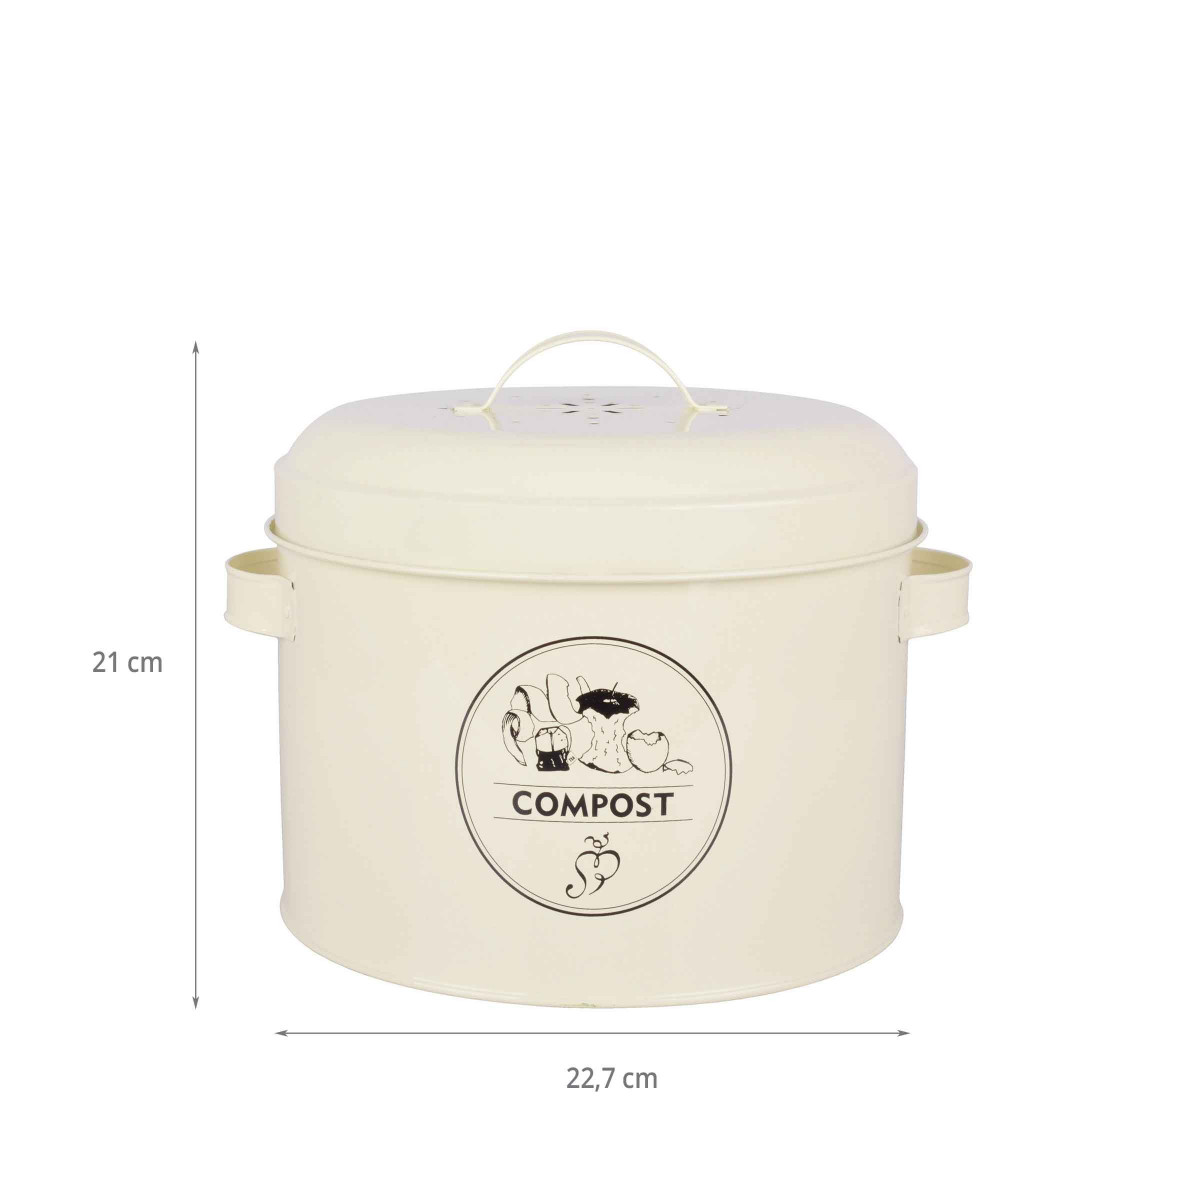 seau compost avec filtre 6 3 litres. Black Bedroom Furniture Sets. Home Design Ideas